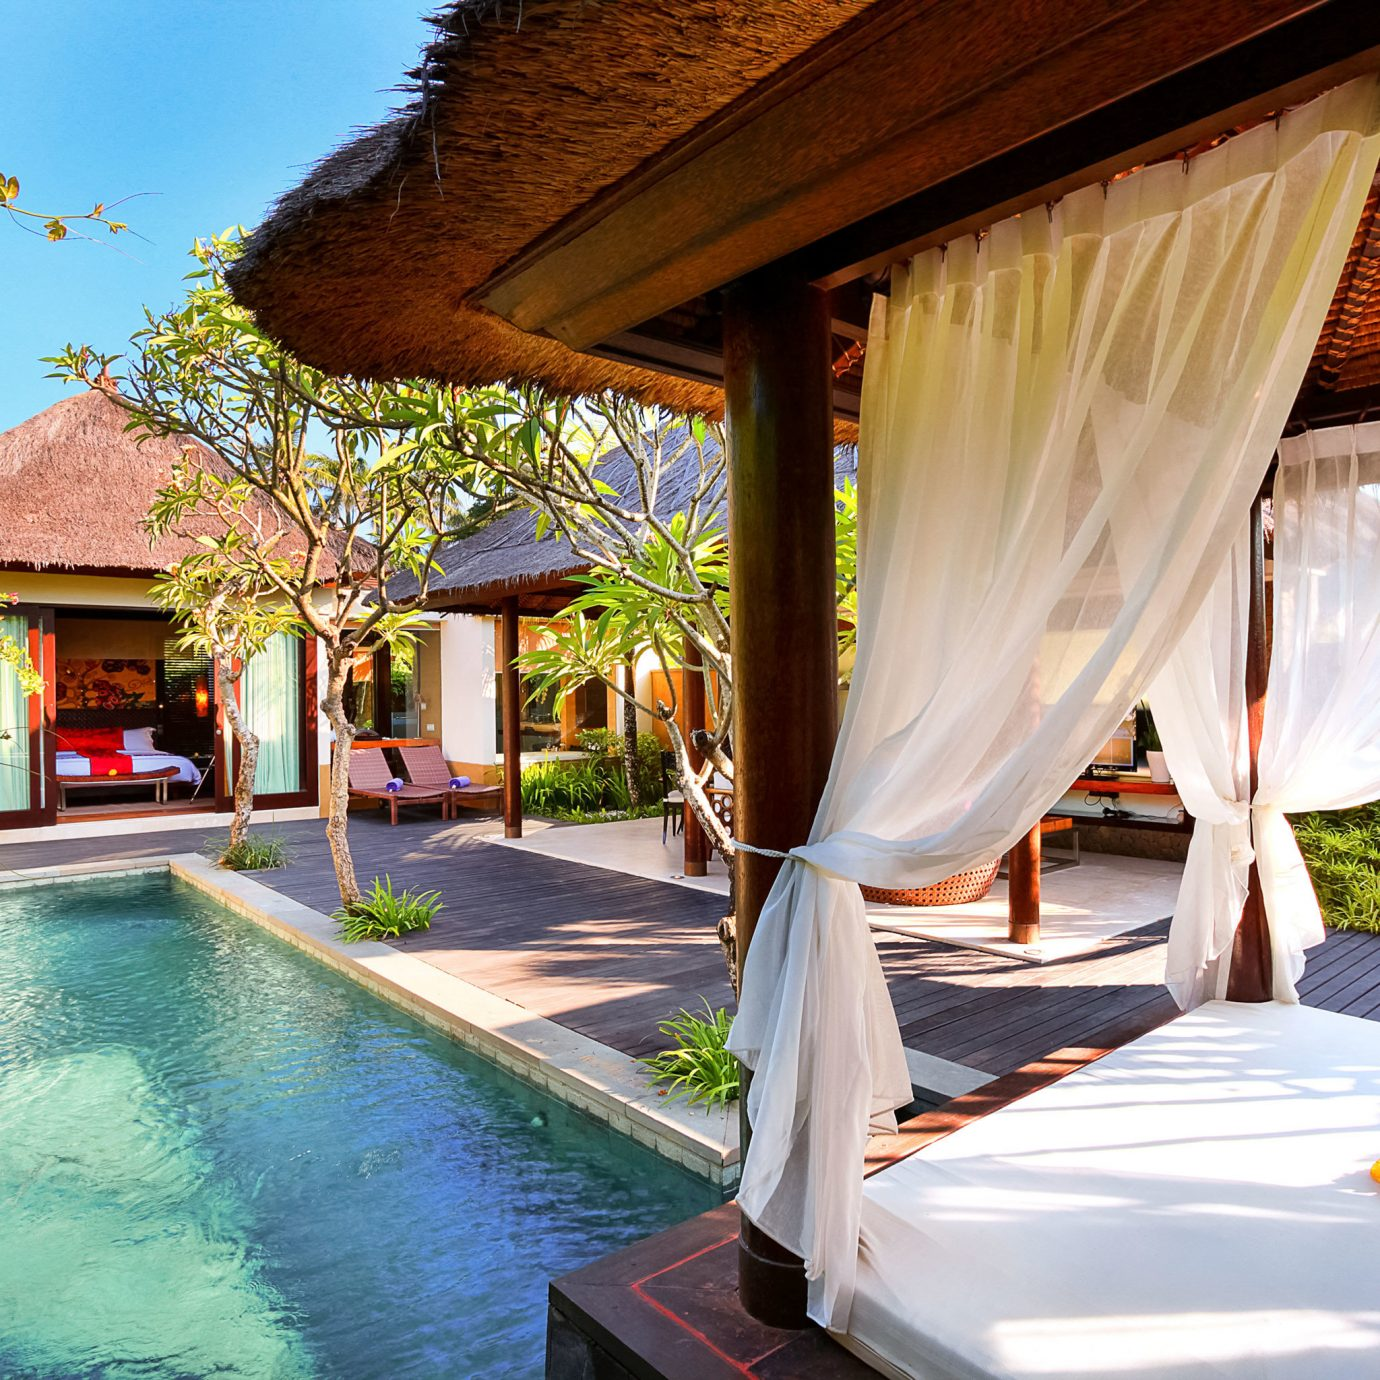 Bedroom Play Pool Resort Villa tree leisure property swimming pool home backyard eco hotel